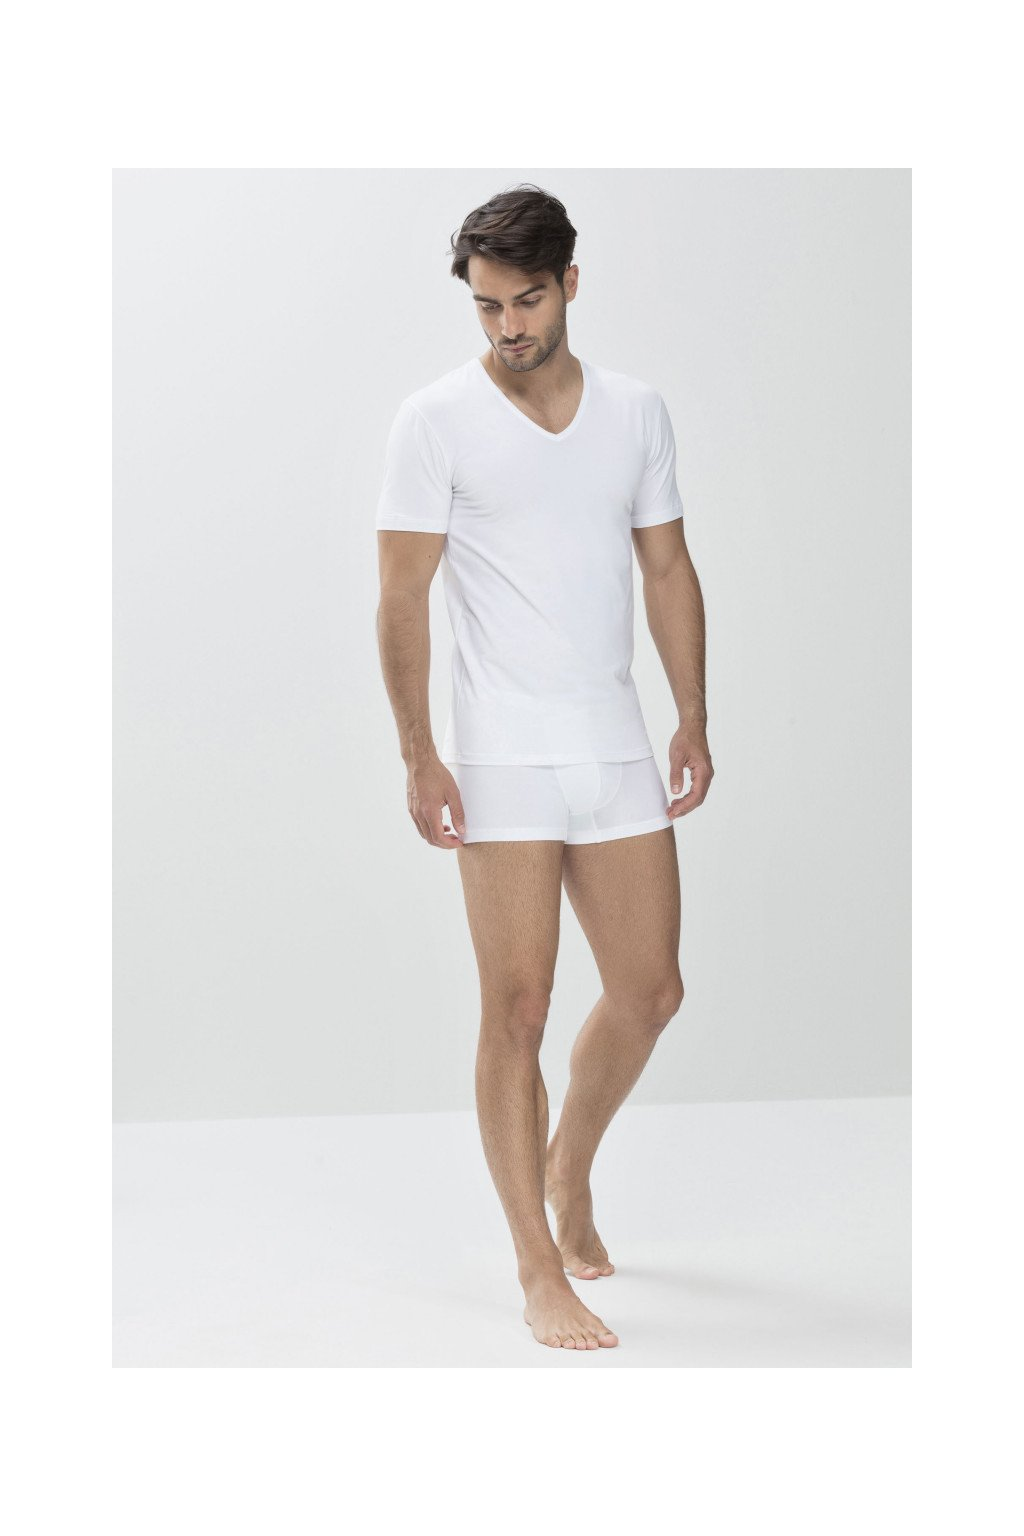 Tričko Mey V-neck Dry Cotton 46007